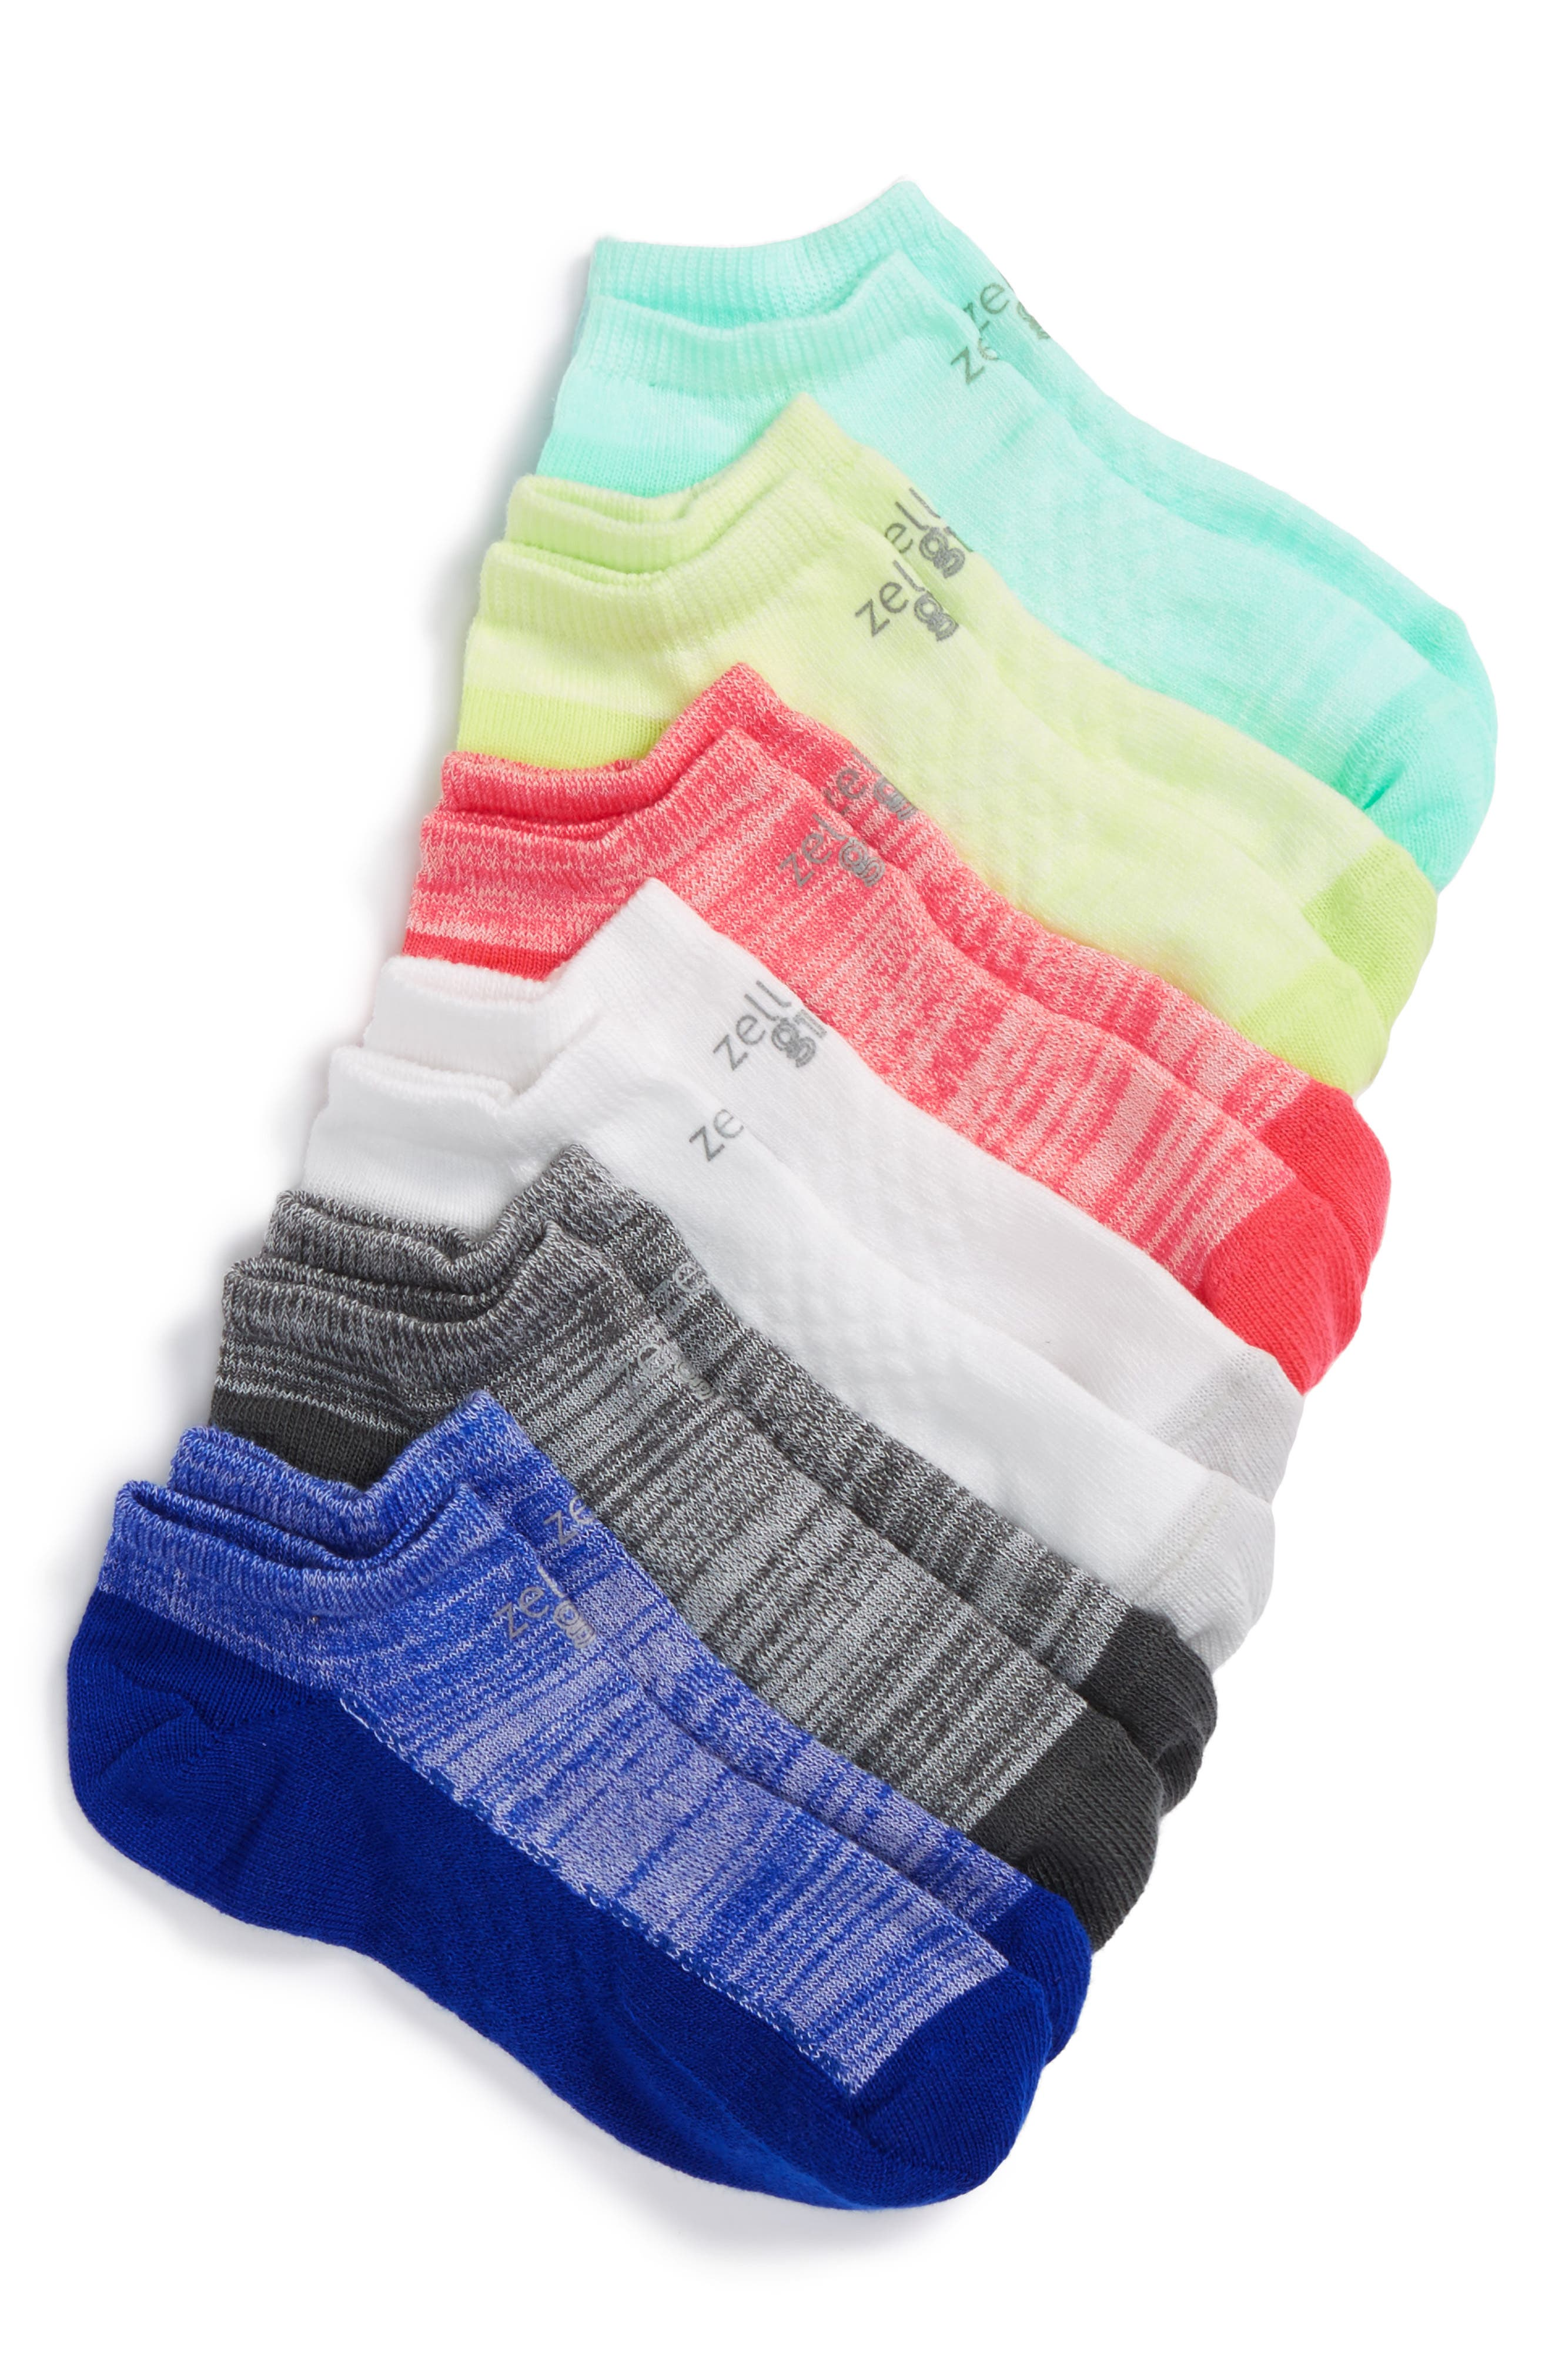 6-Pack Ankle Socks,                             Main thumbnail 6, color,